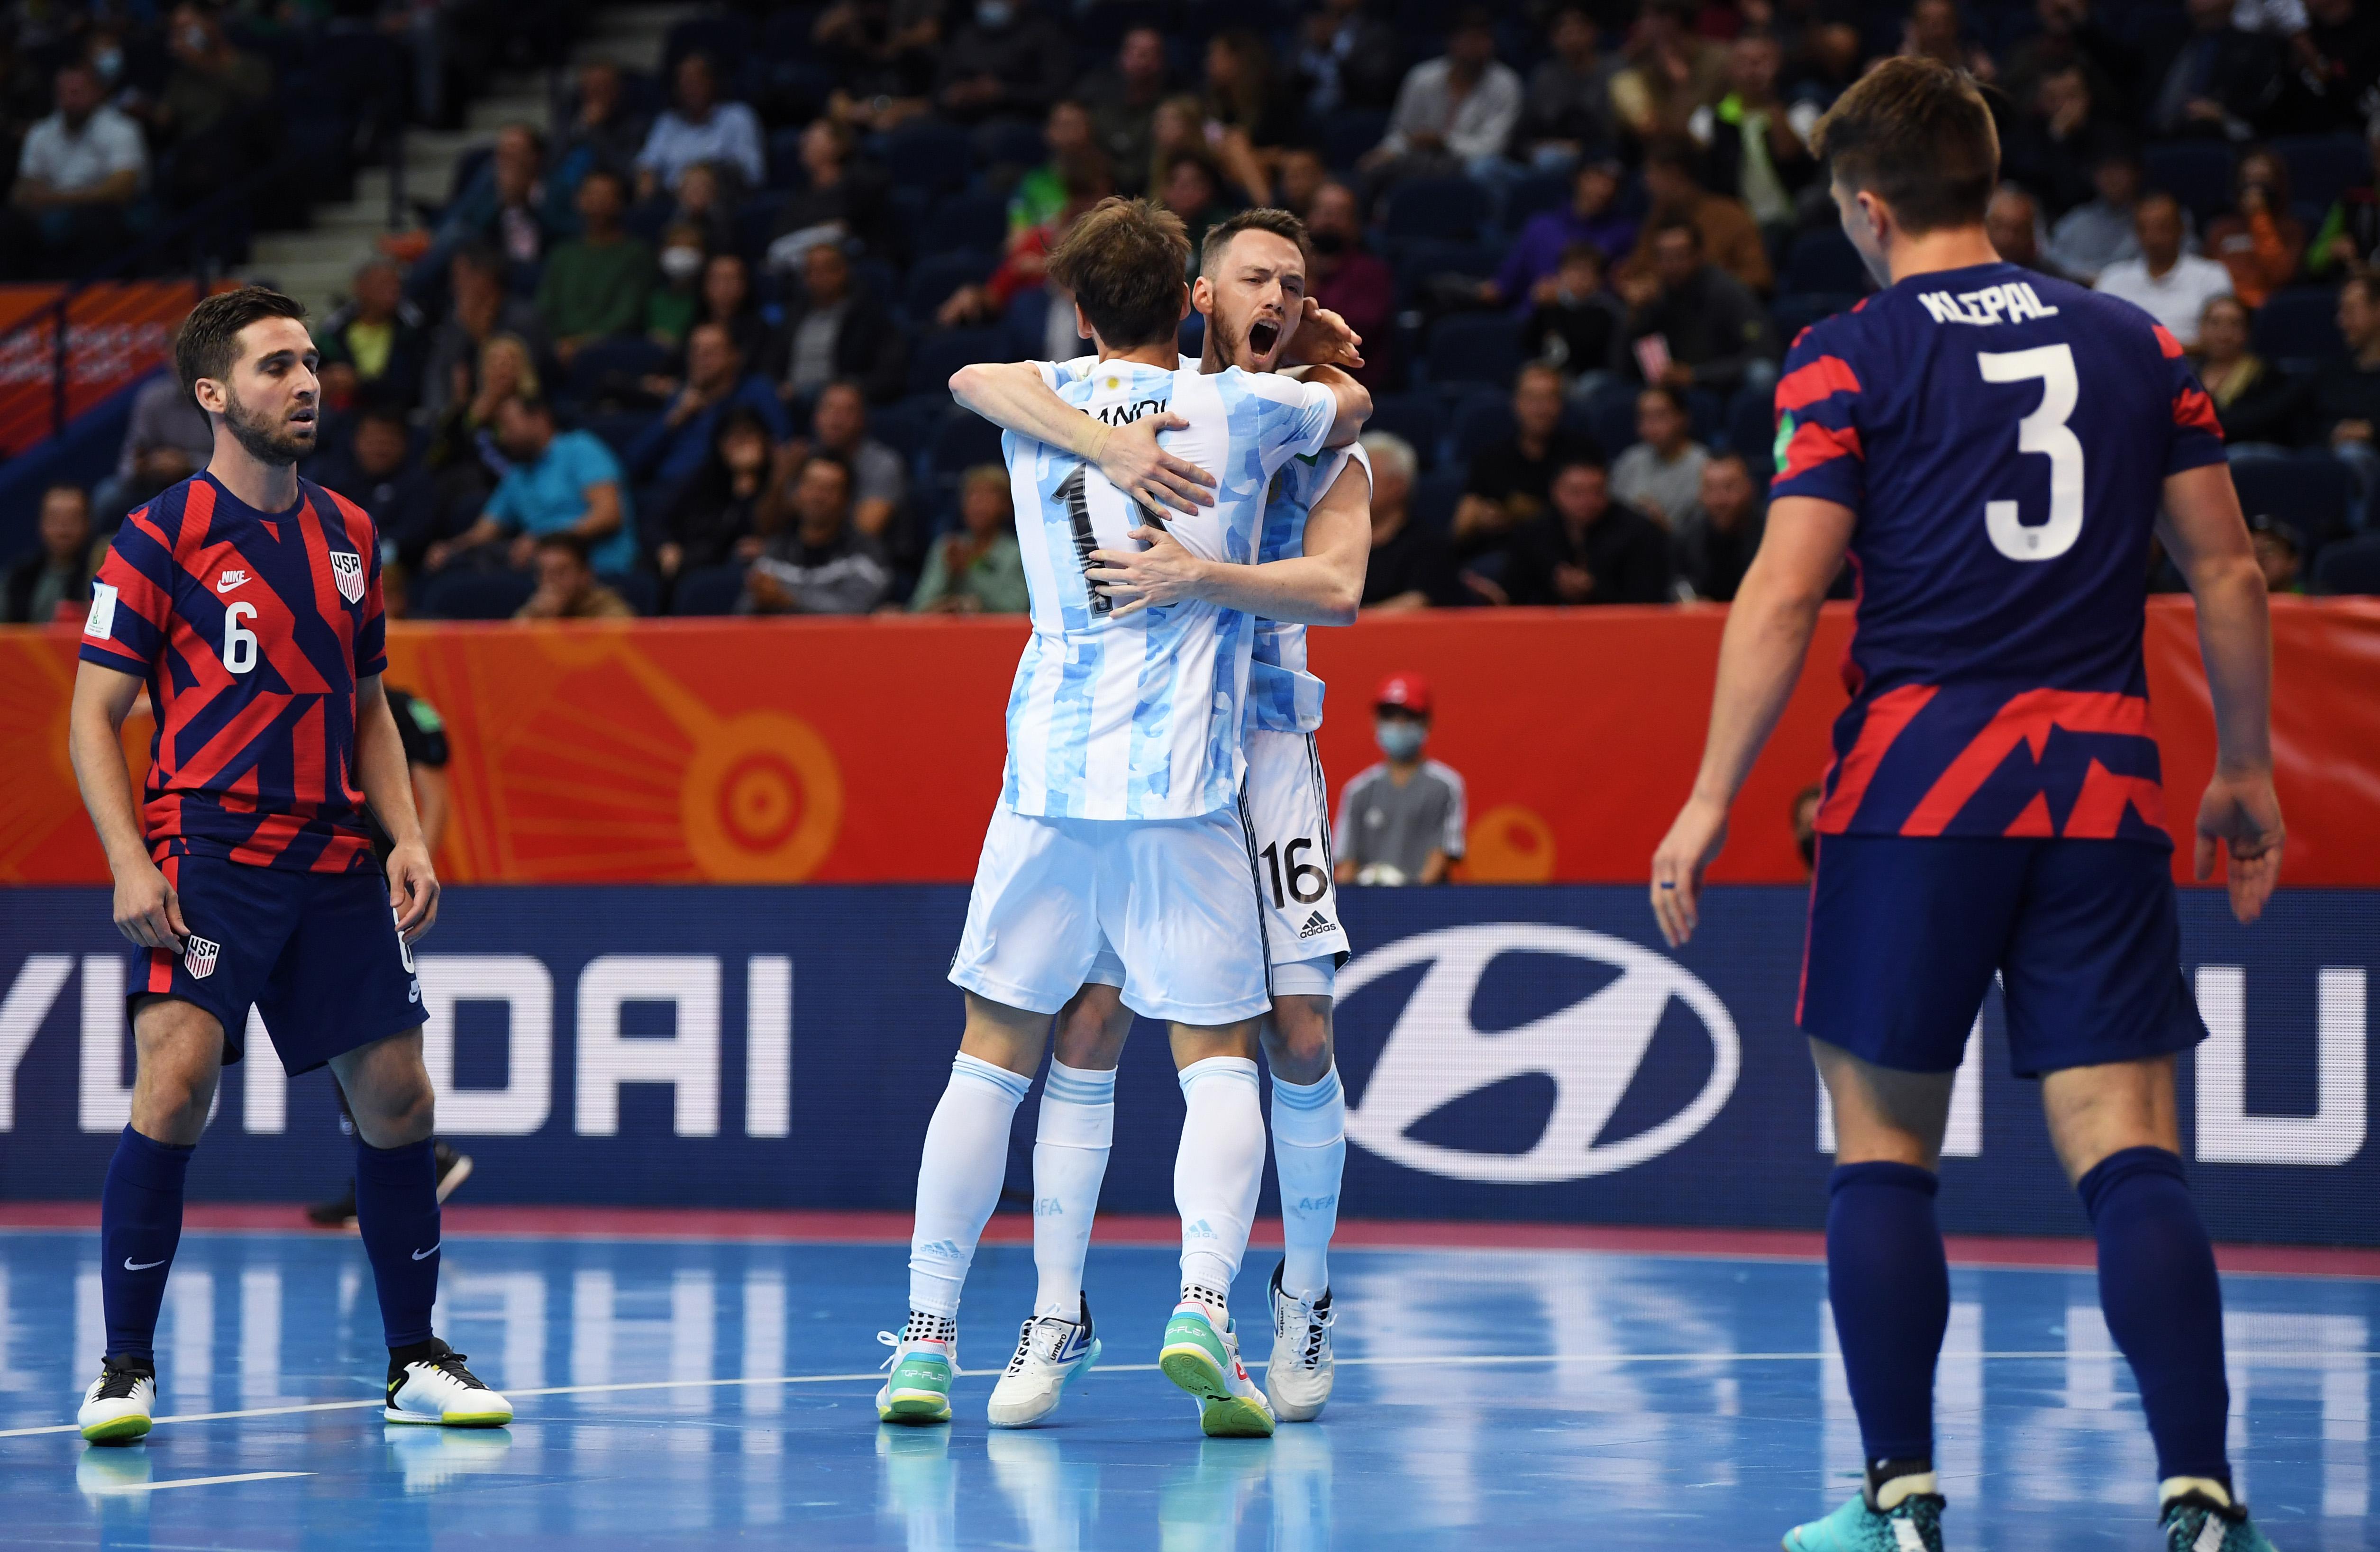 Matchday 3 overview: Argentina, Spain present trophy credentials